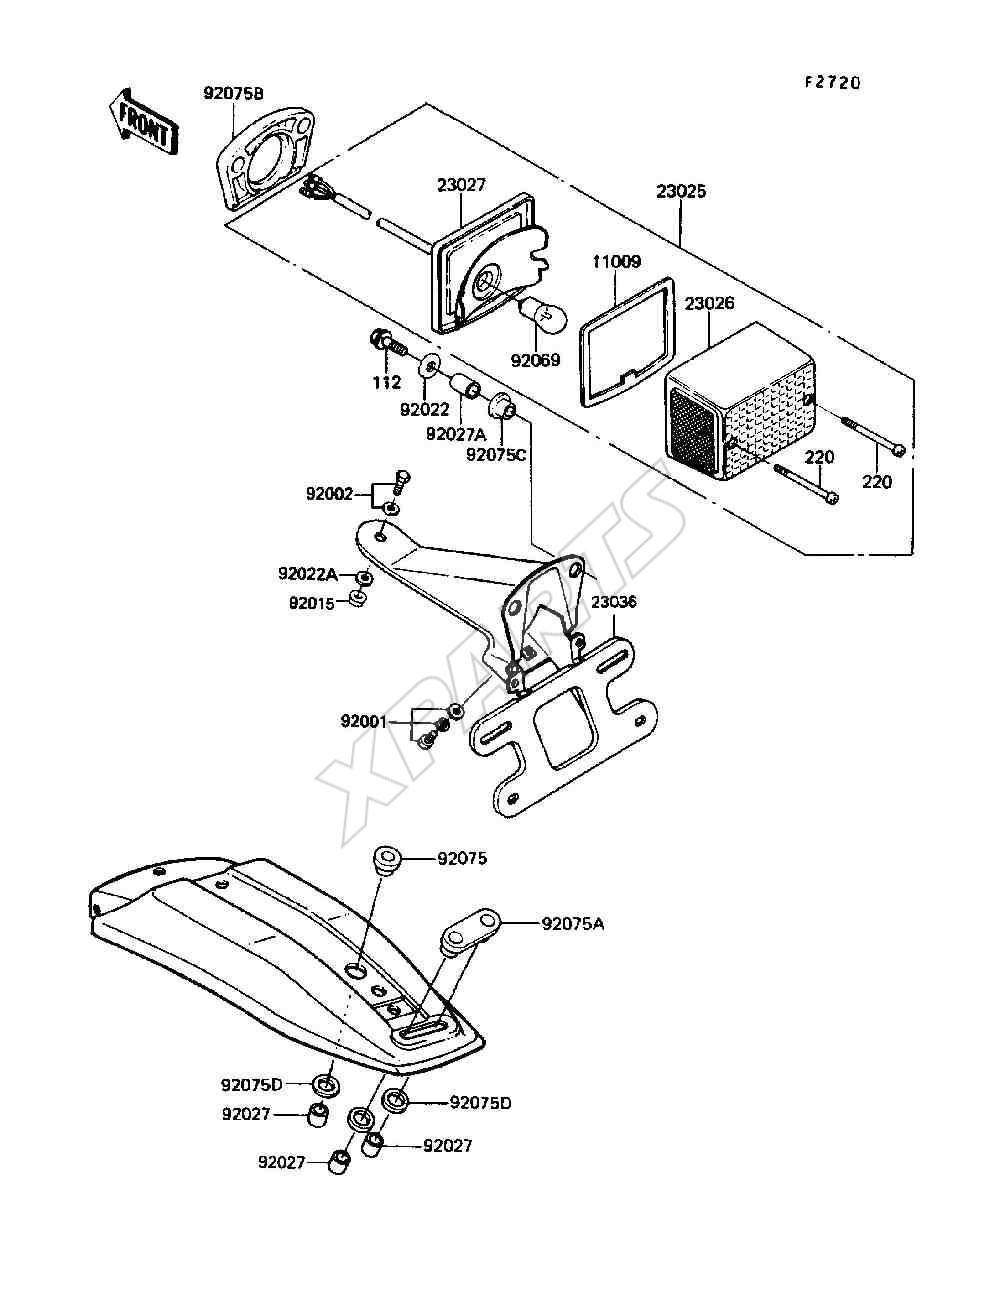 1990 Kawasaki Ke100 Engine - Engine Diagram And Wiring Diagram on kawasaki bayou 220 wiring diagram, kawasaki greenstreak, kawasaki 100 parts, kawasaki 400 wiring diagram, kawasaki vulcan 800 wiring diagram, kawasaki f5, john deere 100 wiring diagram, audi 100 wiring diagram, kawasaki 500 wiring diagram, kawasaki g5 wiring diagram, kawasaki b8m, kawasaki 600 wiring diagram, kawasaki electrical diagrams, kawasaki 4 wheeler wiring diagram, kawasaki cdi wiring diagram, kawasaki atv wiring diagram, kawasaki 750 wiring diagram, cub cadet 100 wiring diagram, kawasaki 1100 zxi wiring-diagram, kawasaki bayou 300 wiring diagram,